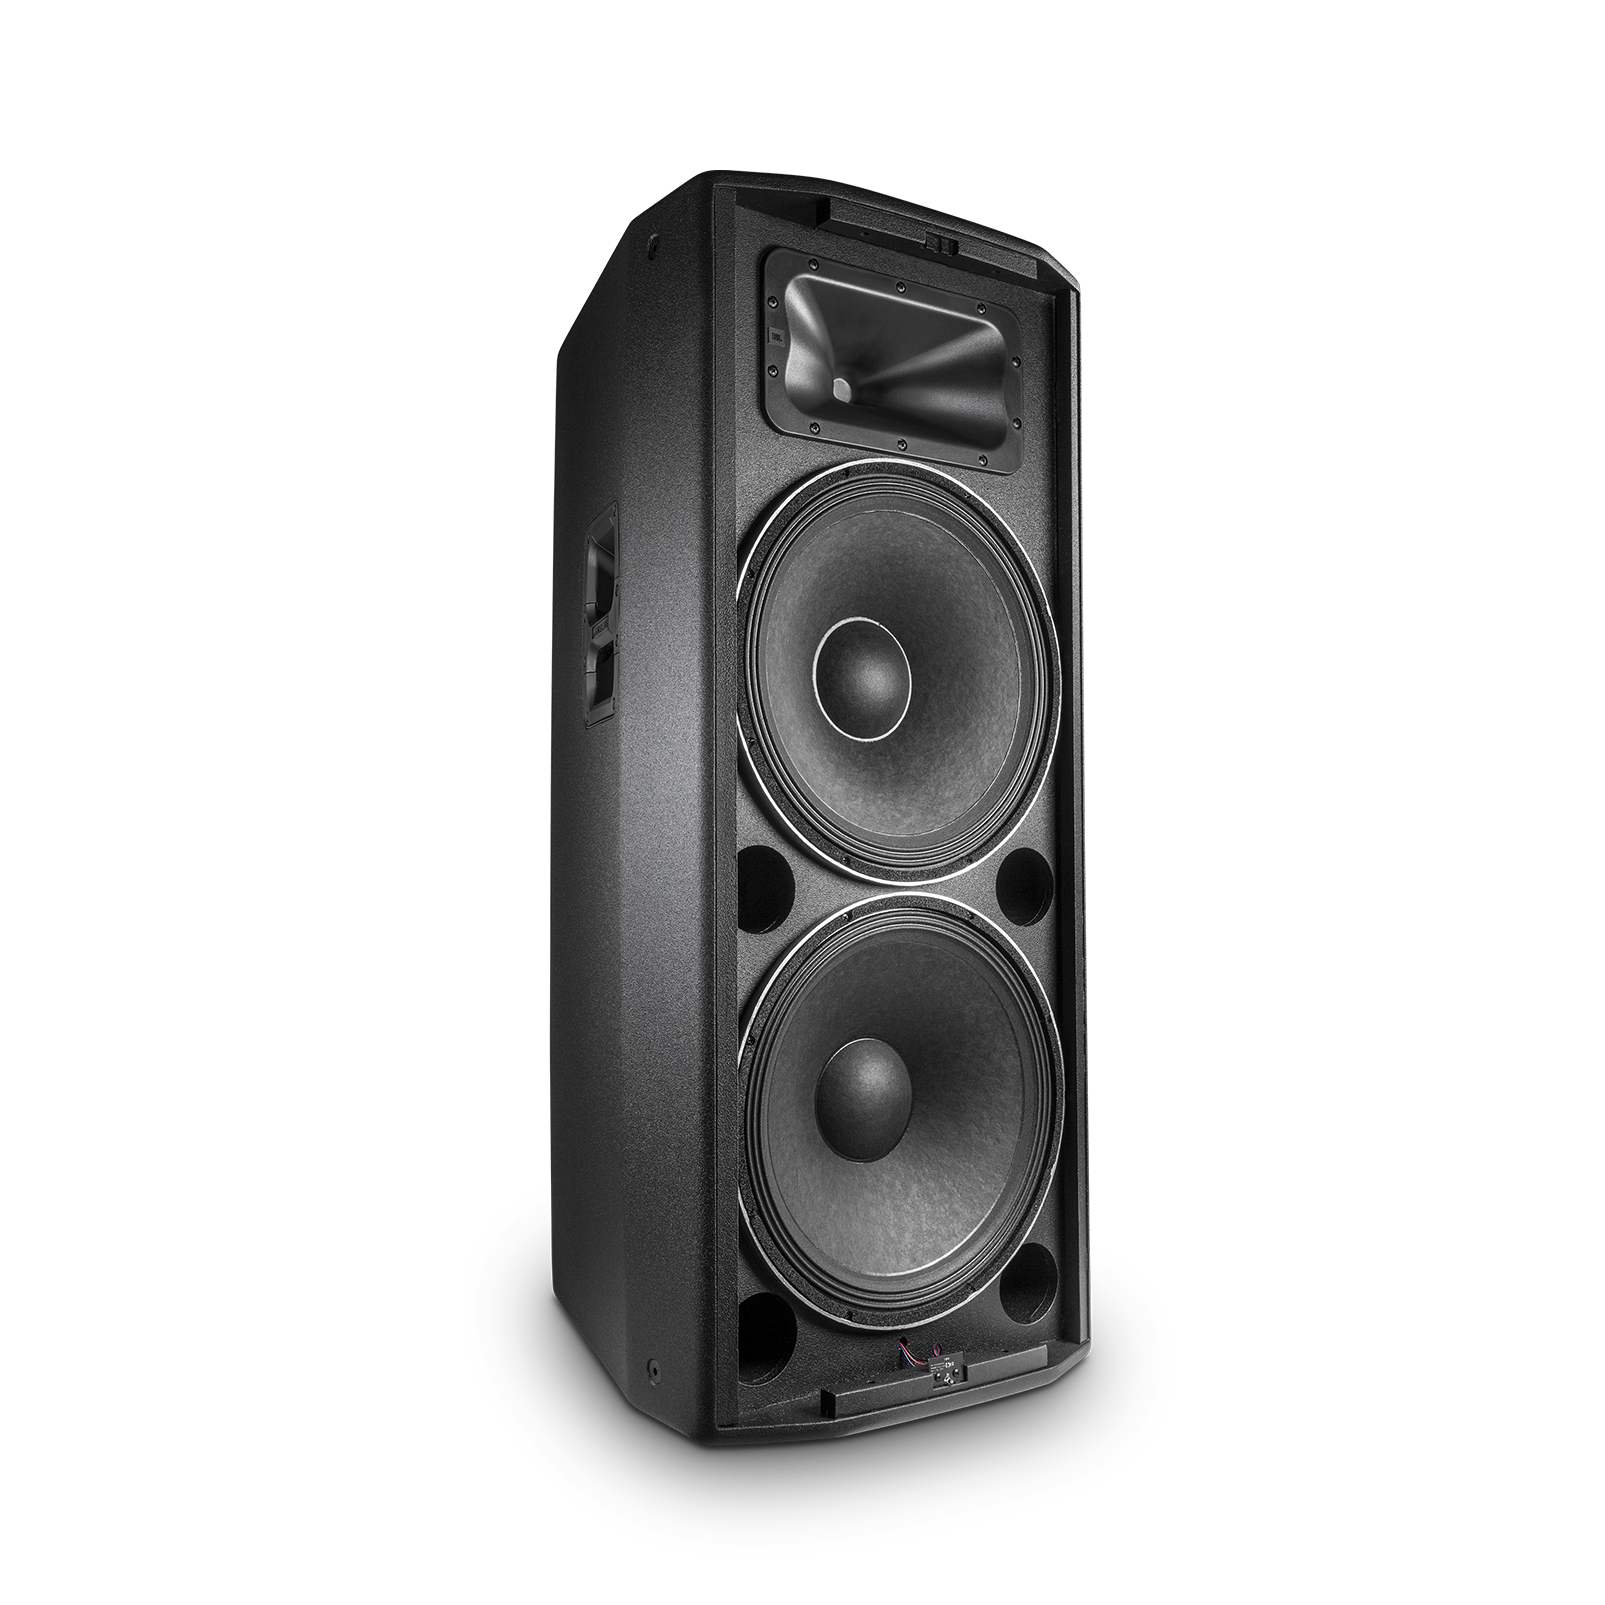 "JBL PRX825 - Black - Dual 15"" Two-Way Full-Range Main System with Wi-Fi - Detailshot 1"